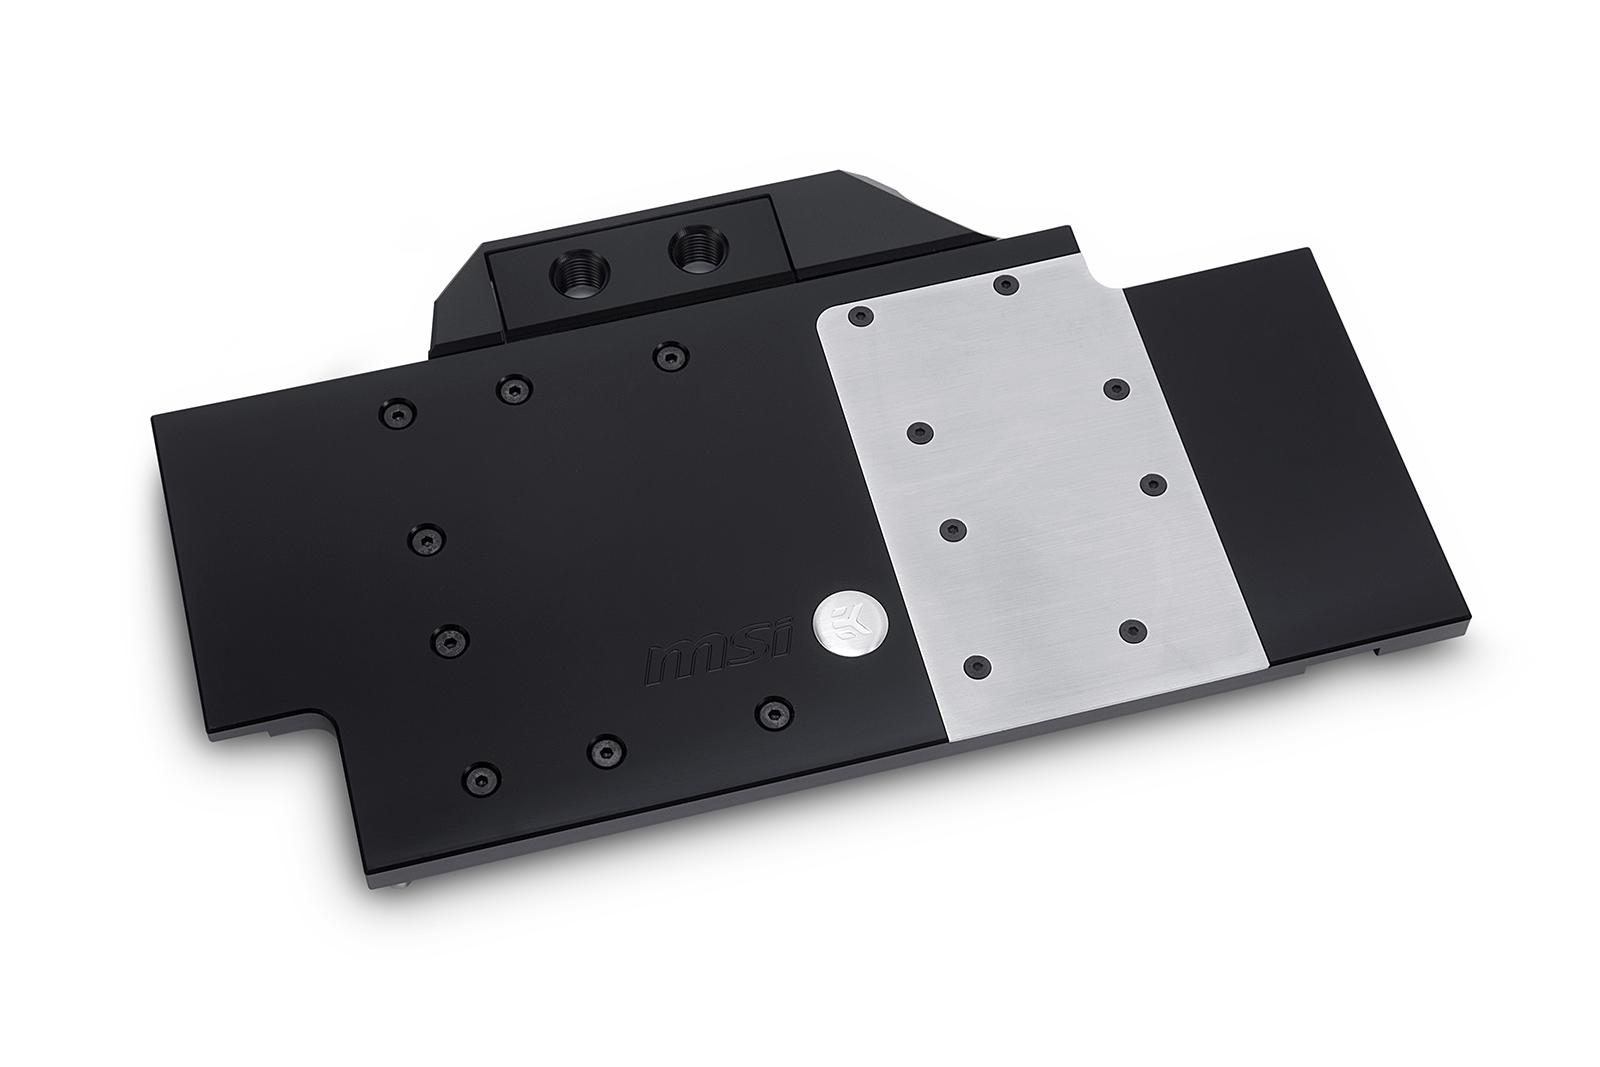 EK releases water block for MSI® GeForce® GTX 1080 Ti